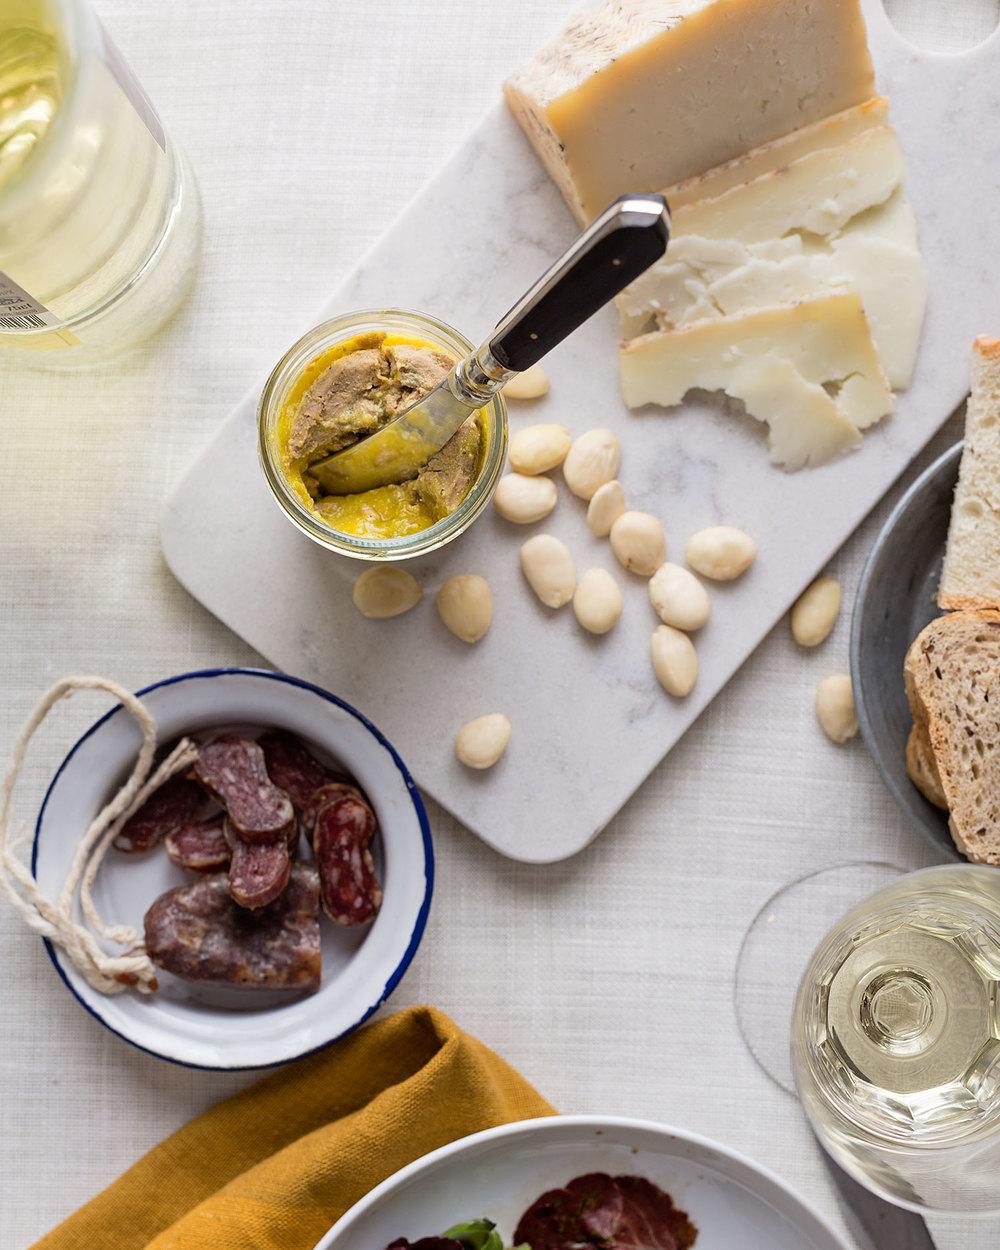 corina-landa-food-photography-fotografia-gastronomica-71.jpg